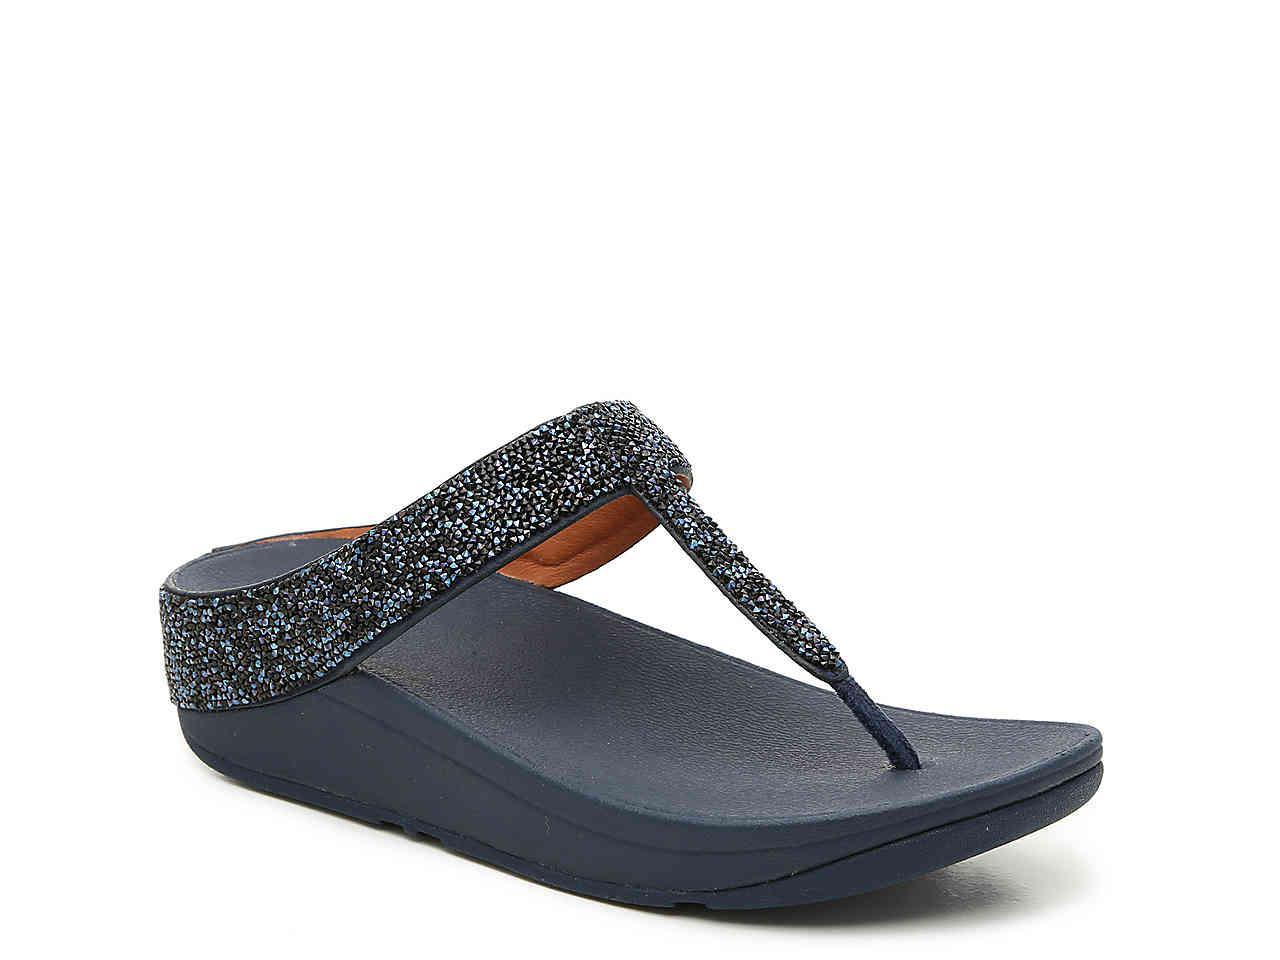 eb6da2109999 Lyst - Fitflop Fino Wedge Sandal in Blue